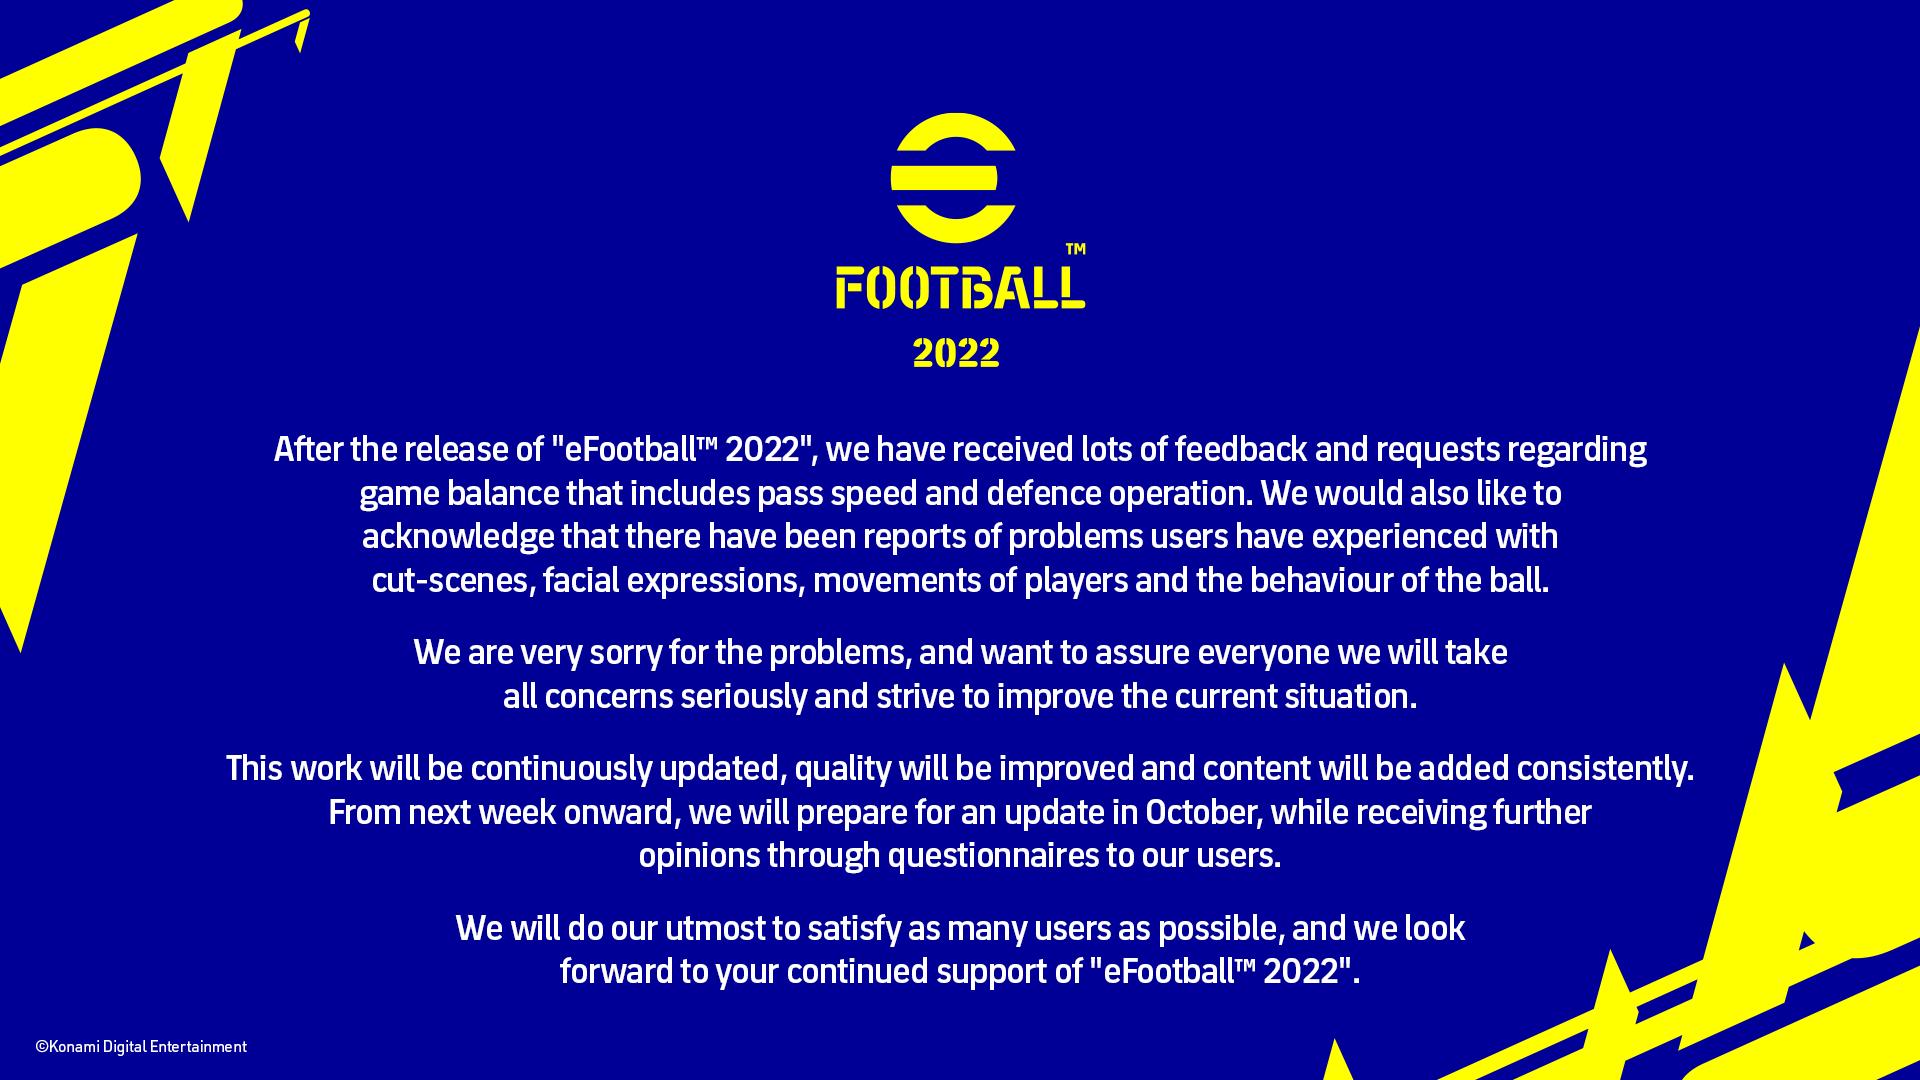 efootball 2022 konami statement